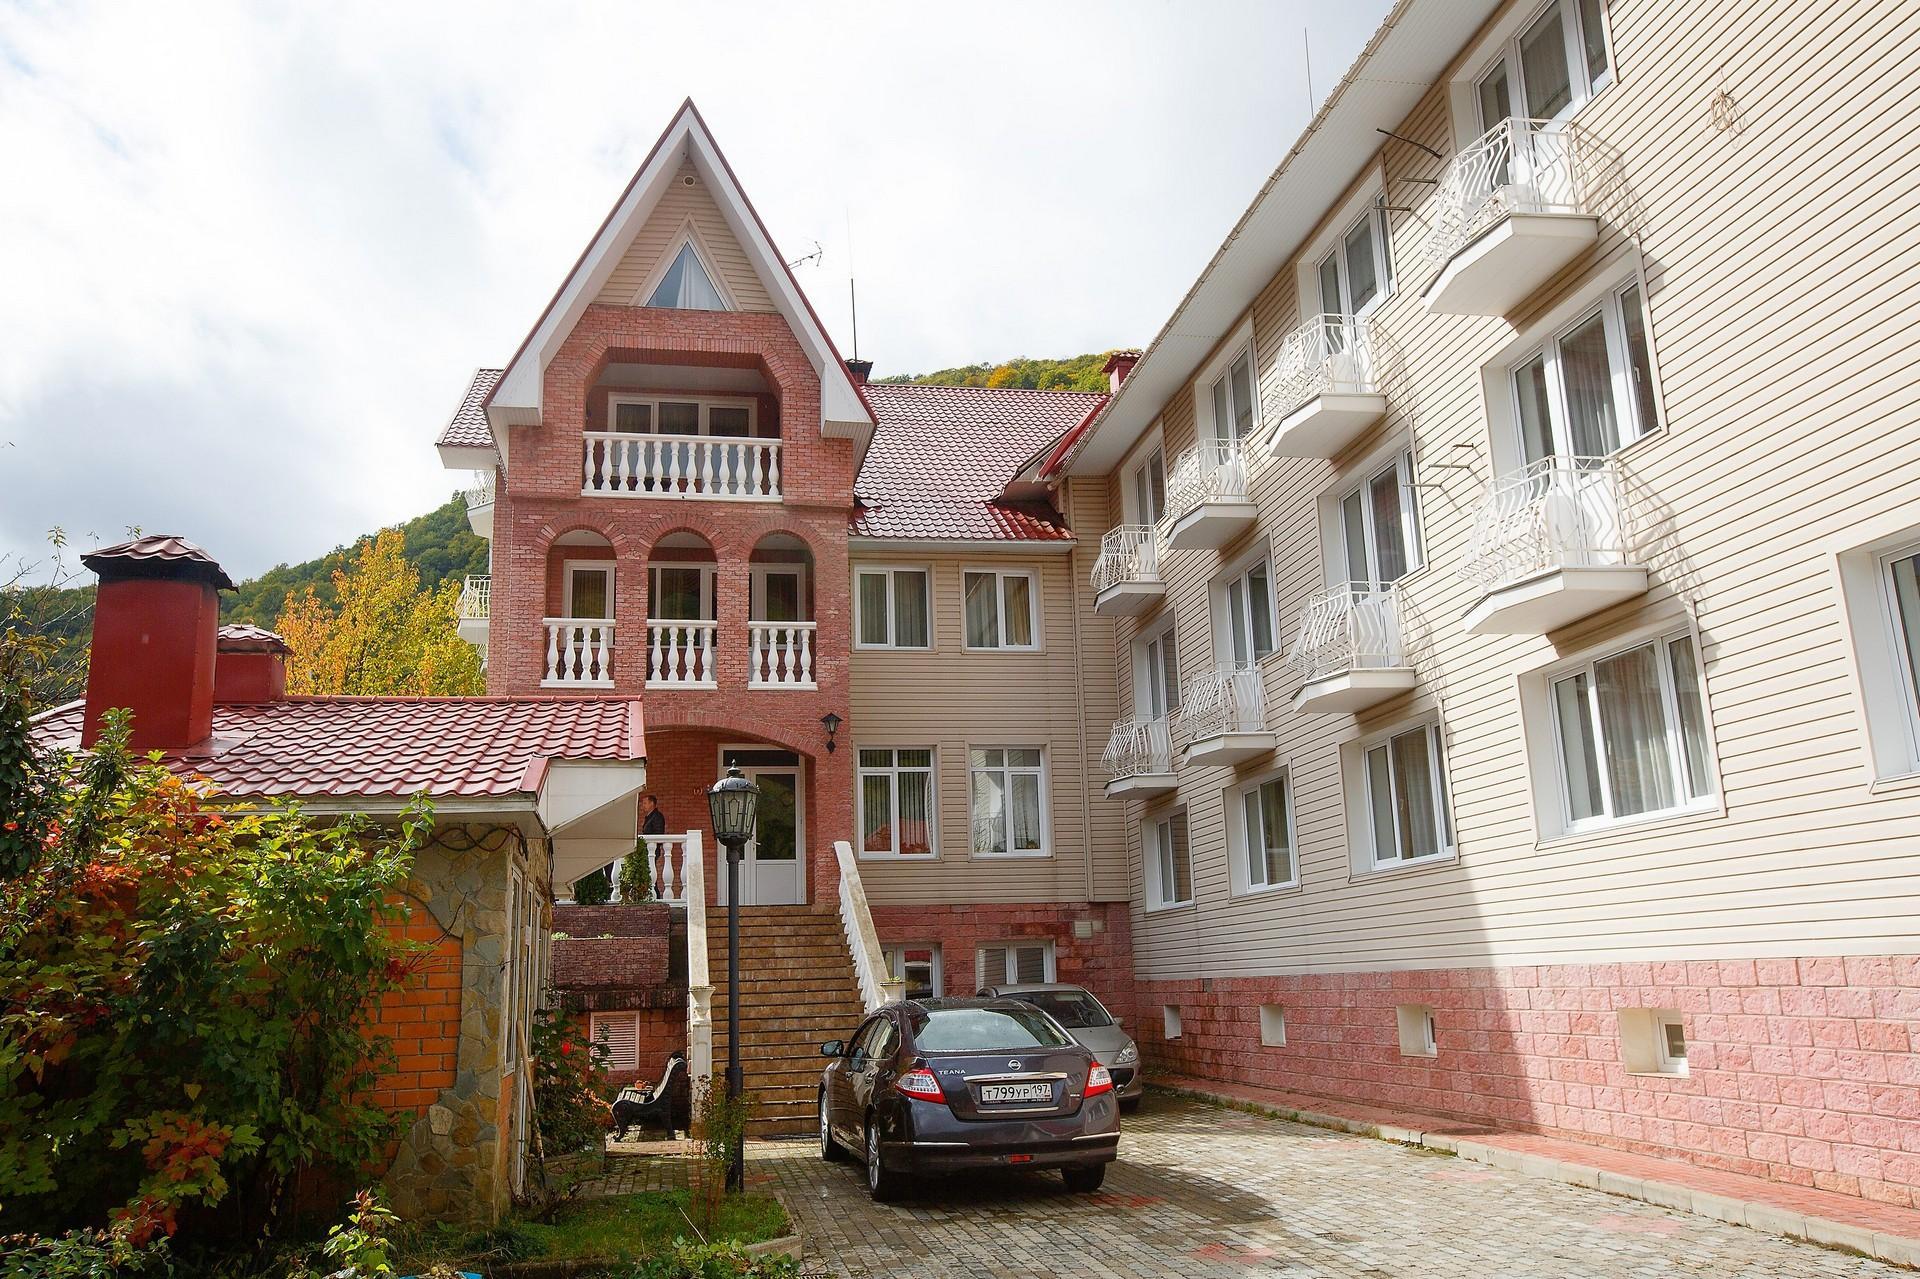 Уютная Вилла в Красной Поляне - image Uyutnaya-Villa-v-Krasnoj-Polyane-1 on https://bizneskvartal.ru